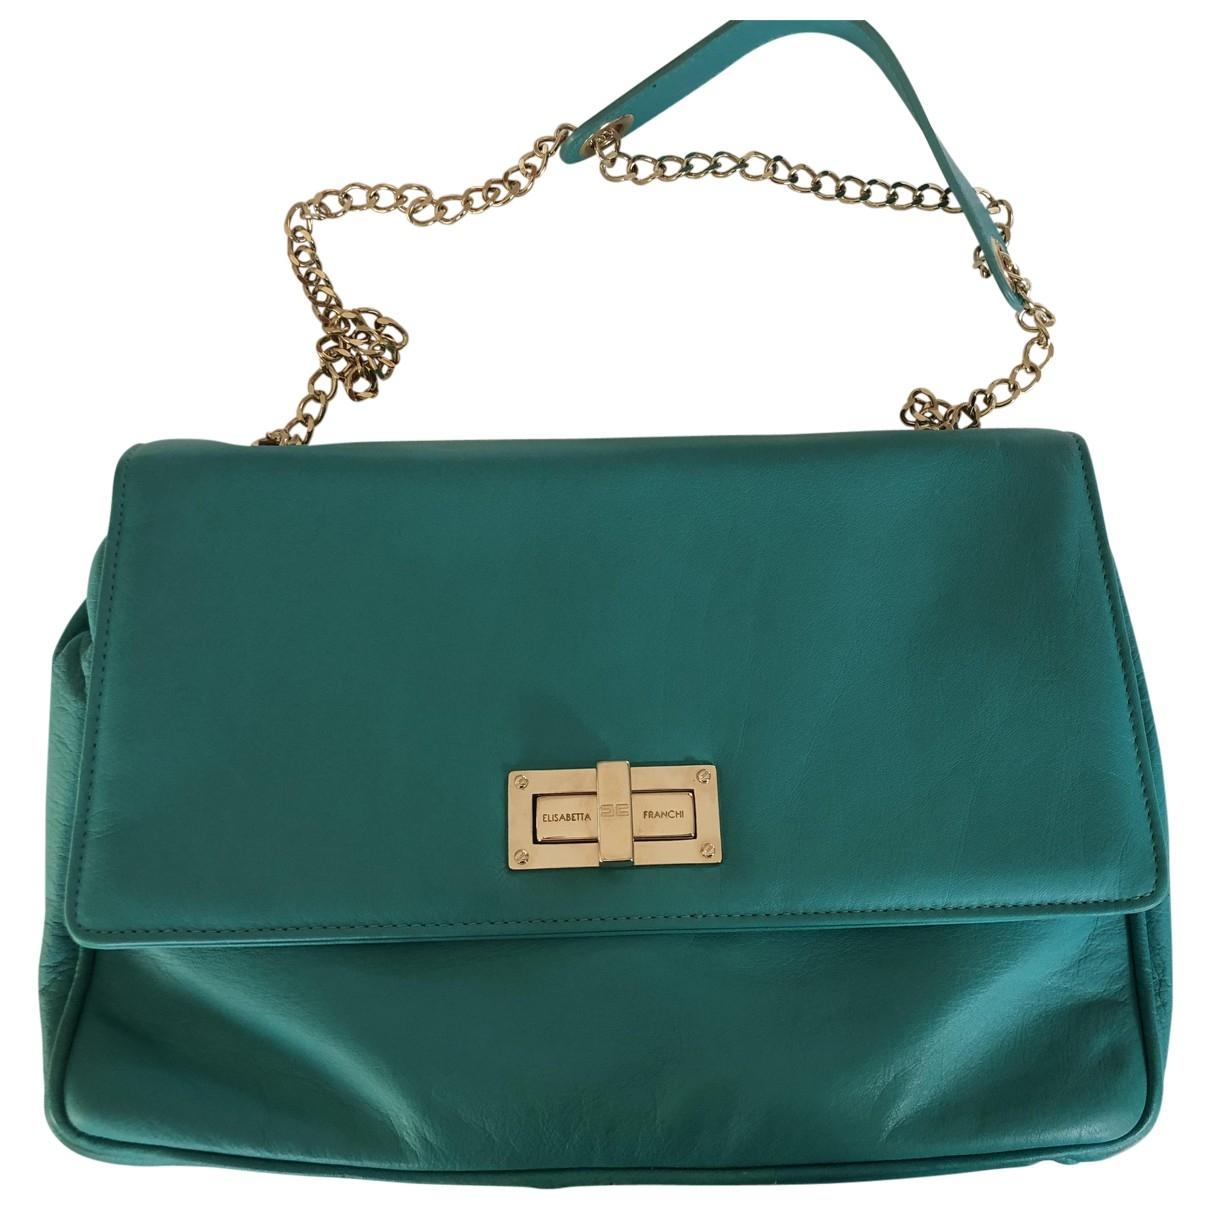 Elisabetta Franchi \N Turquoise Leather handbag for Women \N